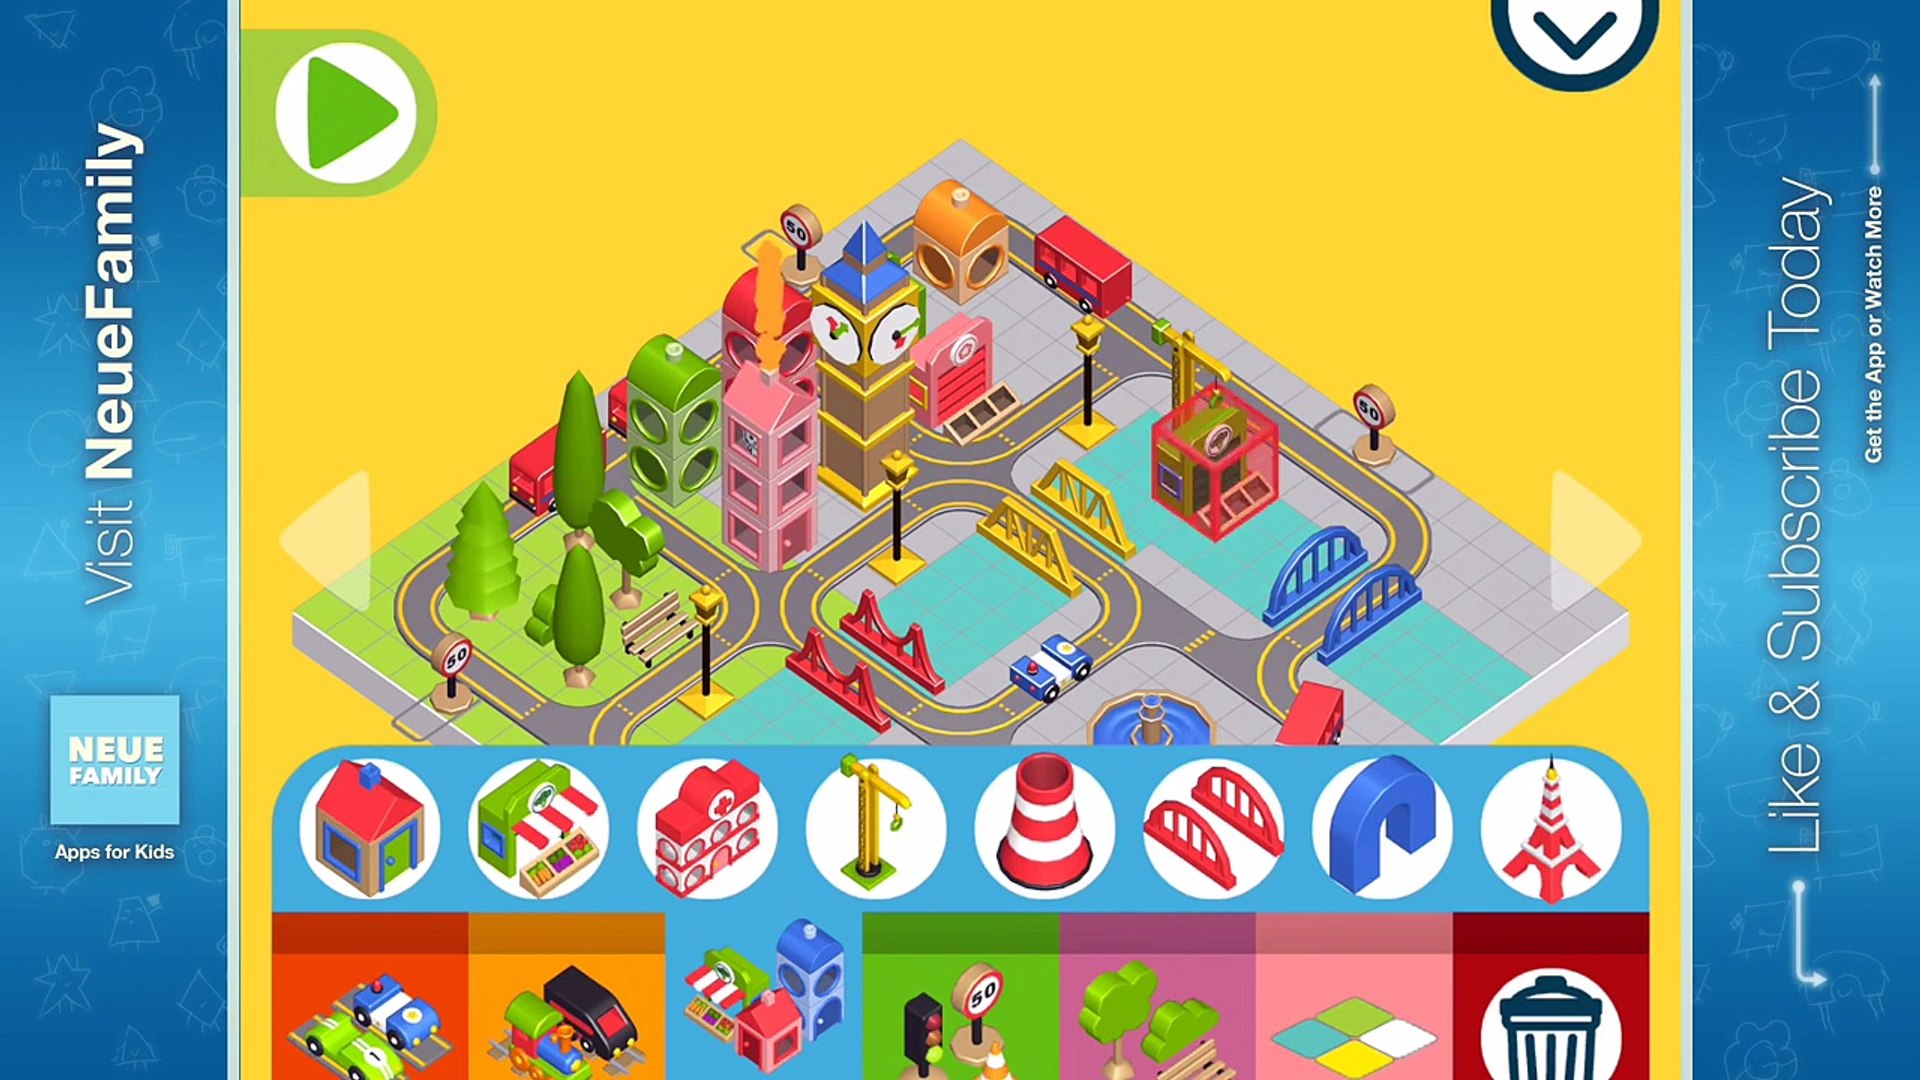 Pango Build City: Kids Activity App